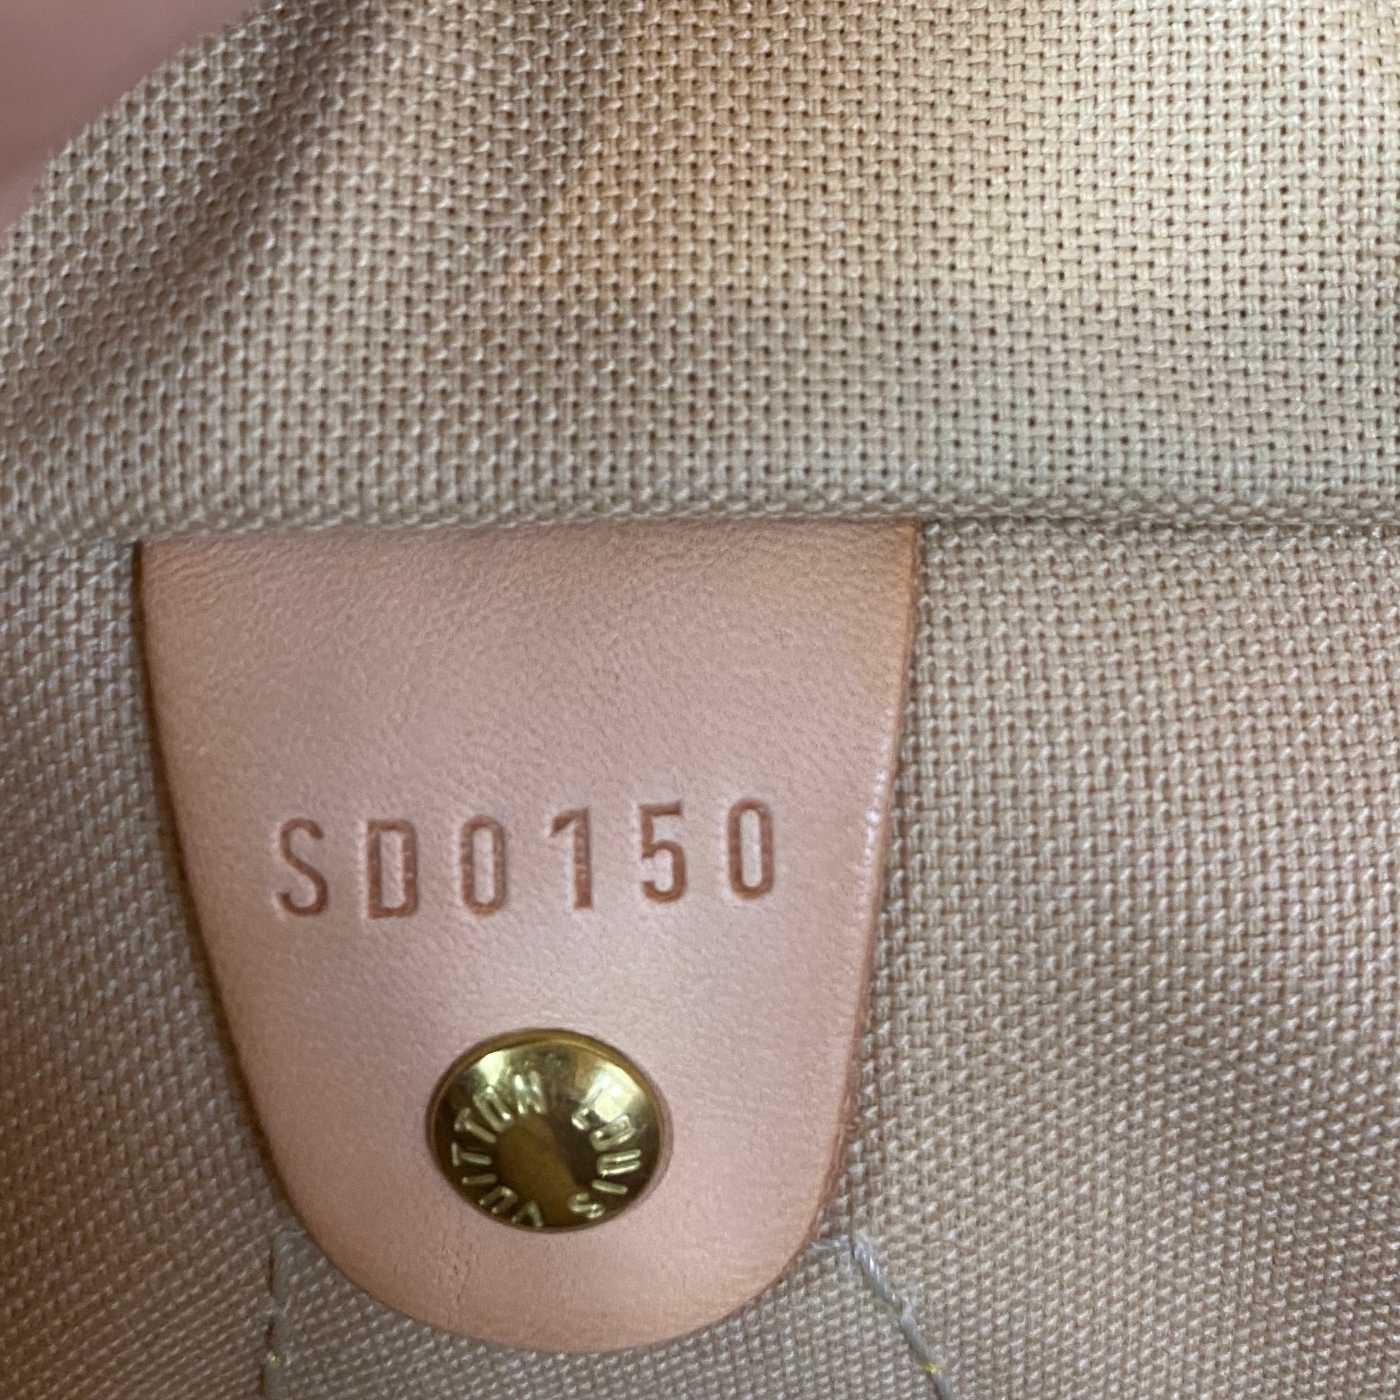 Bolsa Louis Vuitton Speedy 30 Damier Azur